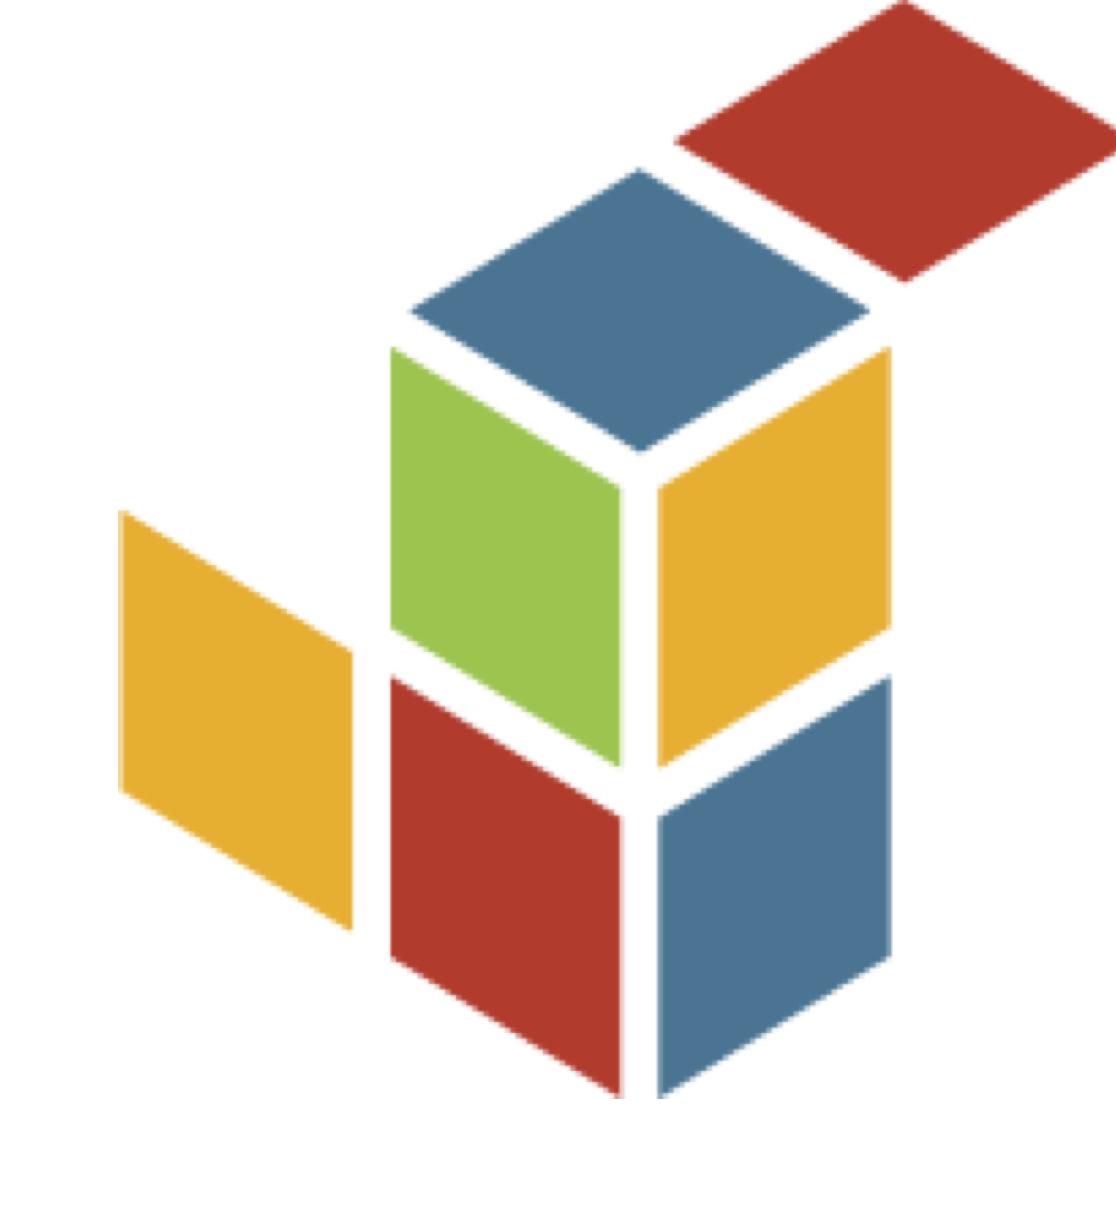 CNIC Blocks colour